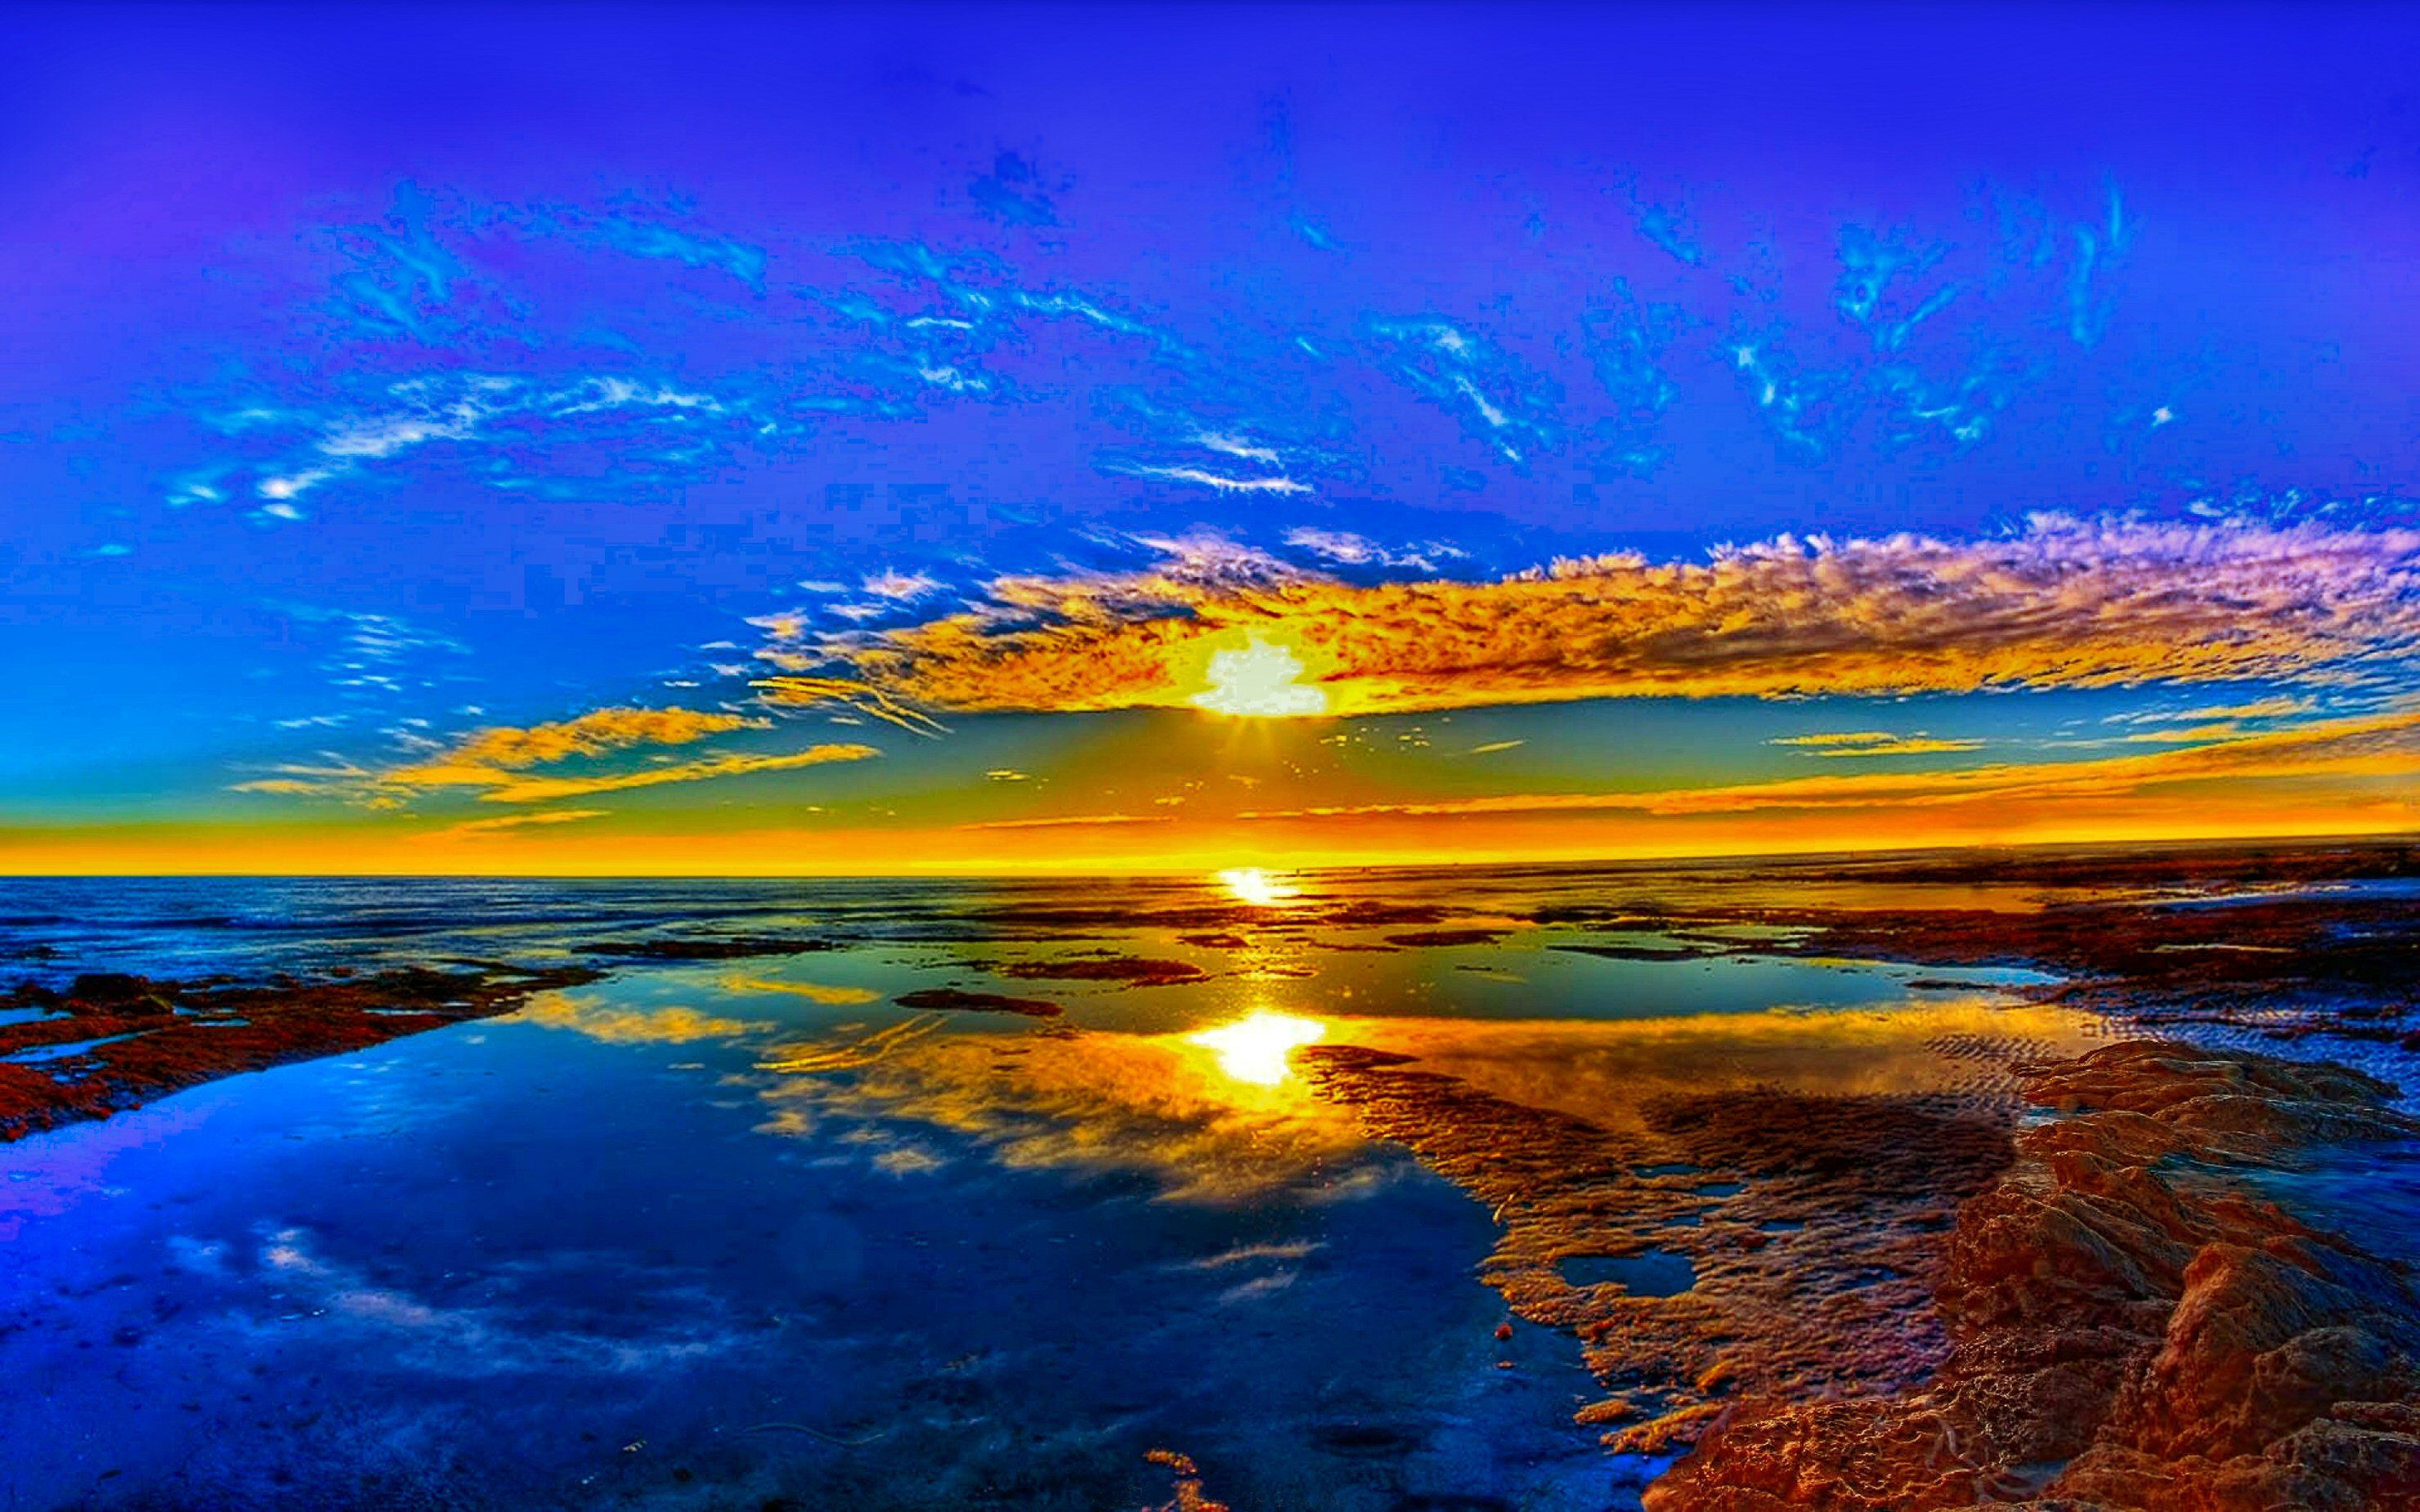 Terra/Natureza Sunset  Opus Horizon Reflection Blue Yellow Beach Scenic Nature Papel de Parede